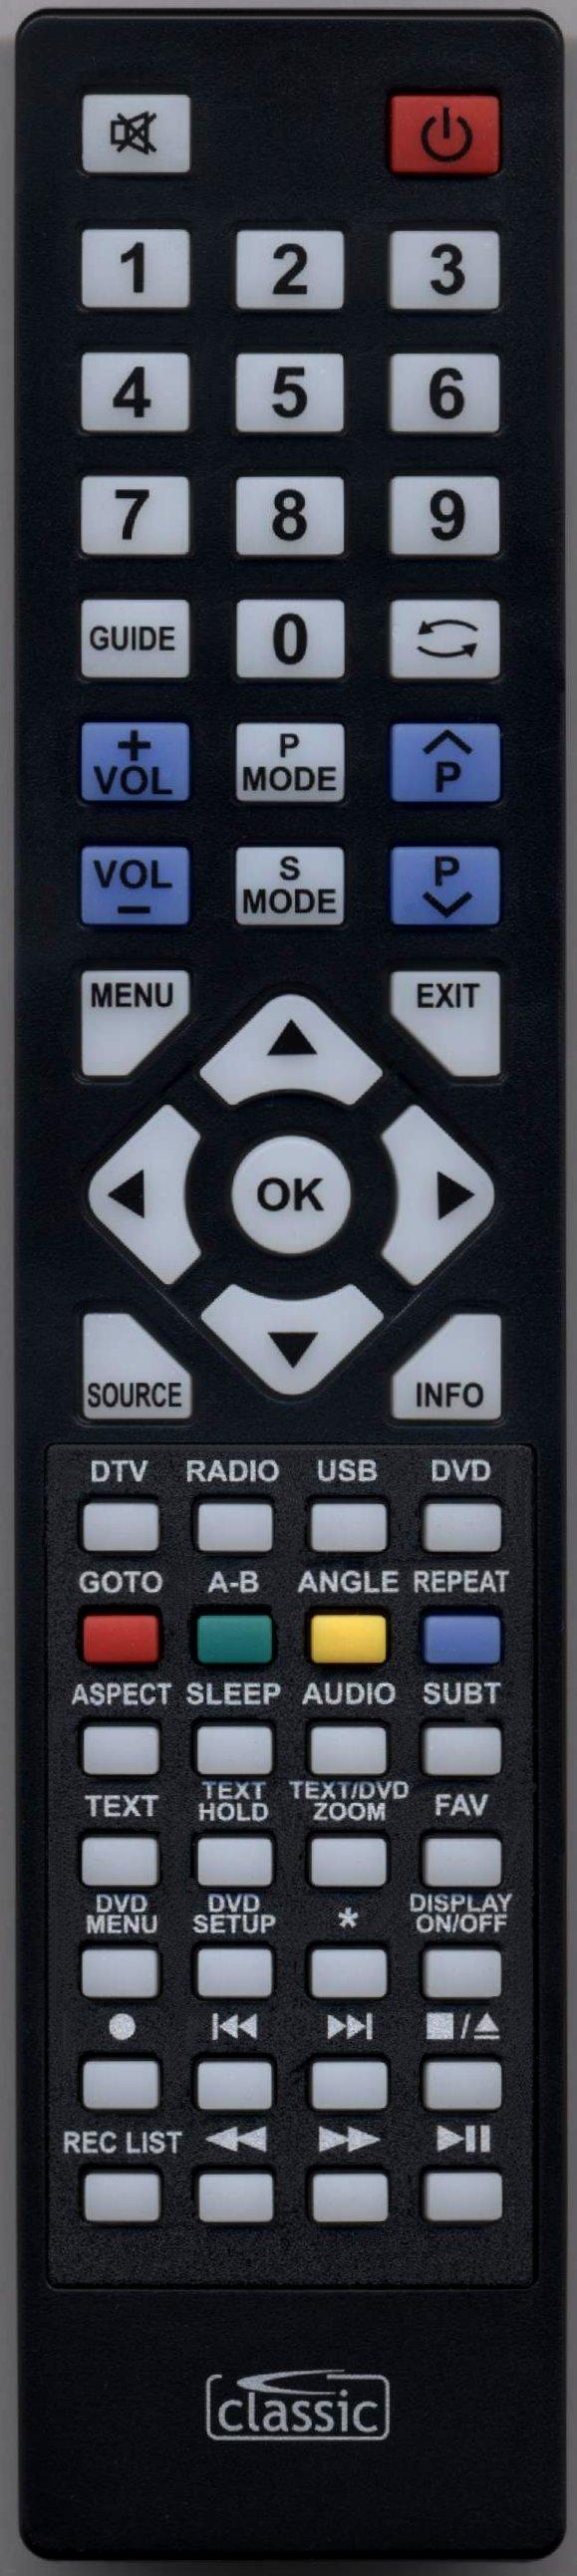 Blaupunkt 23-207I-GB-3B-HKUP-UK Remote Control Alternative